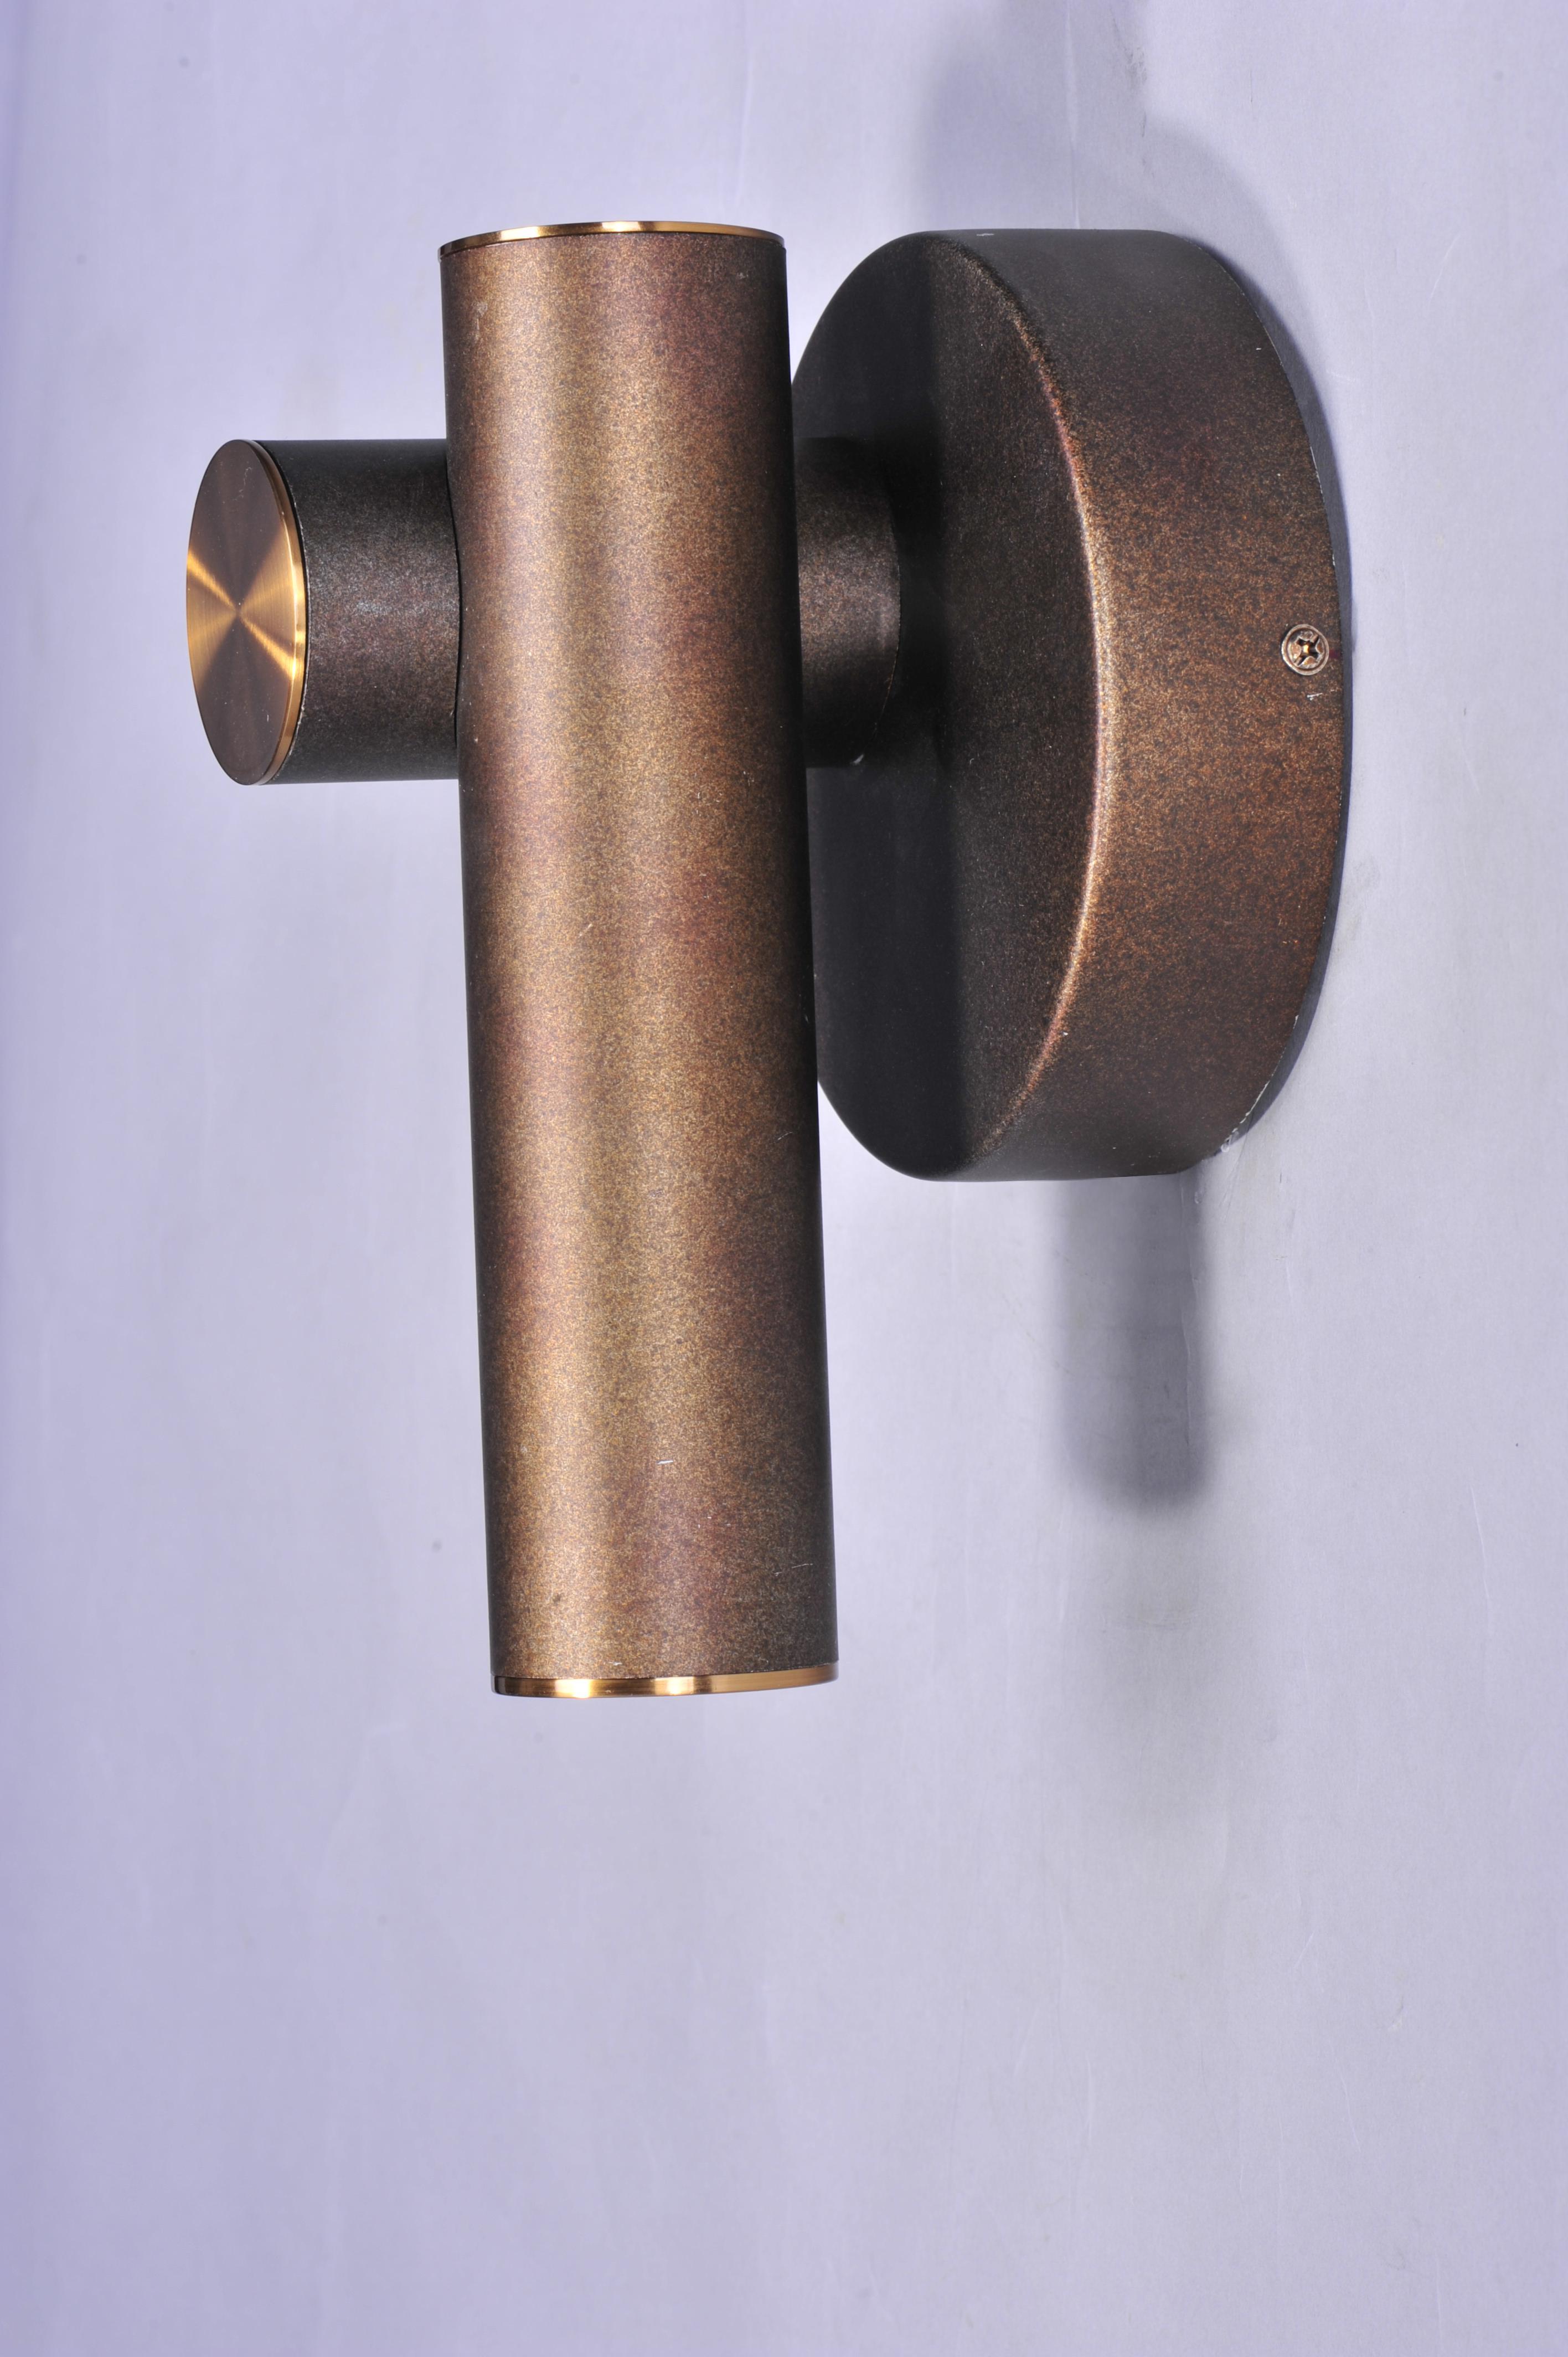 tubular 1 light led wall sconce wall sconce maxim lighting. Black Bedroom Furniture Sets. Home Design Ideas